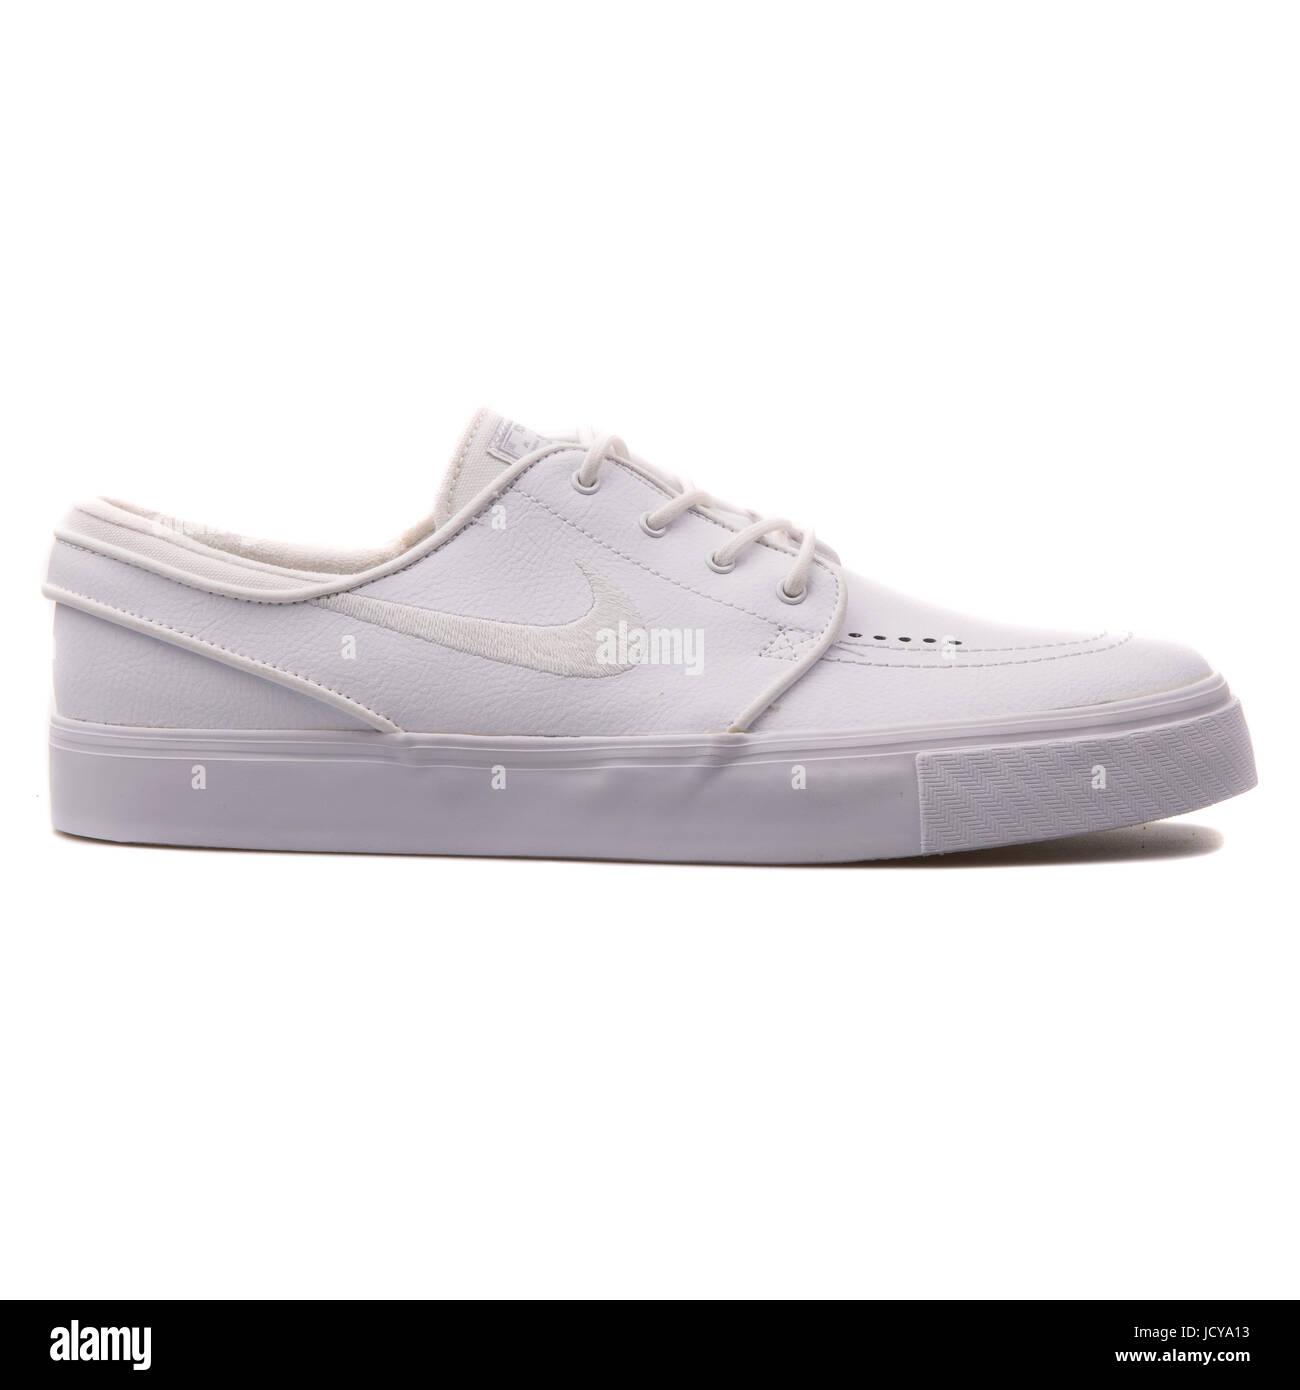 d45e045a24 Nike Zoom Stefan Janoski L White Leather Men's Skateboarding Shoes -  616490-110 - Stock